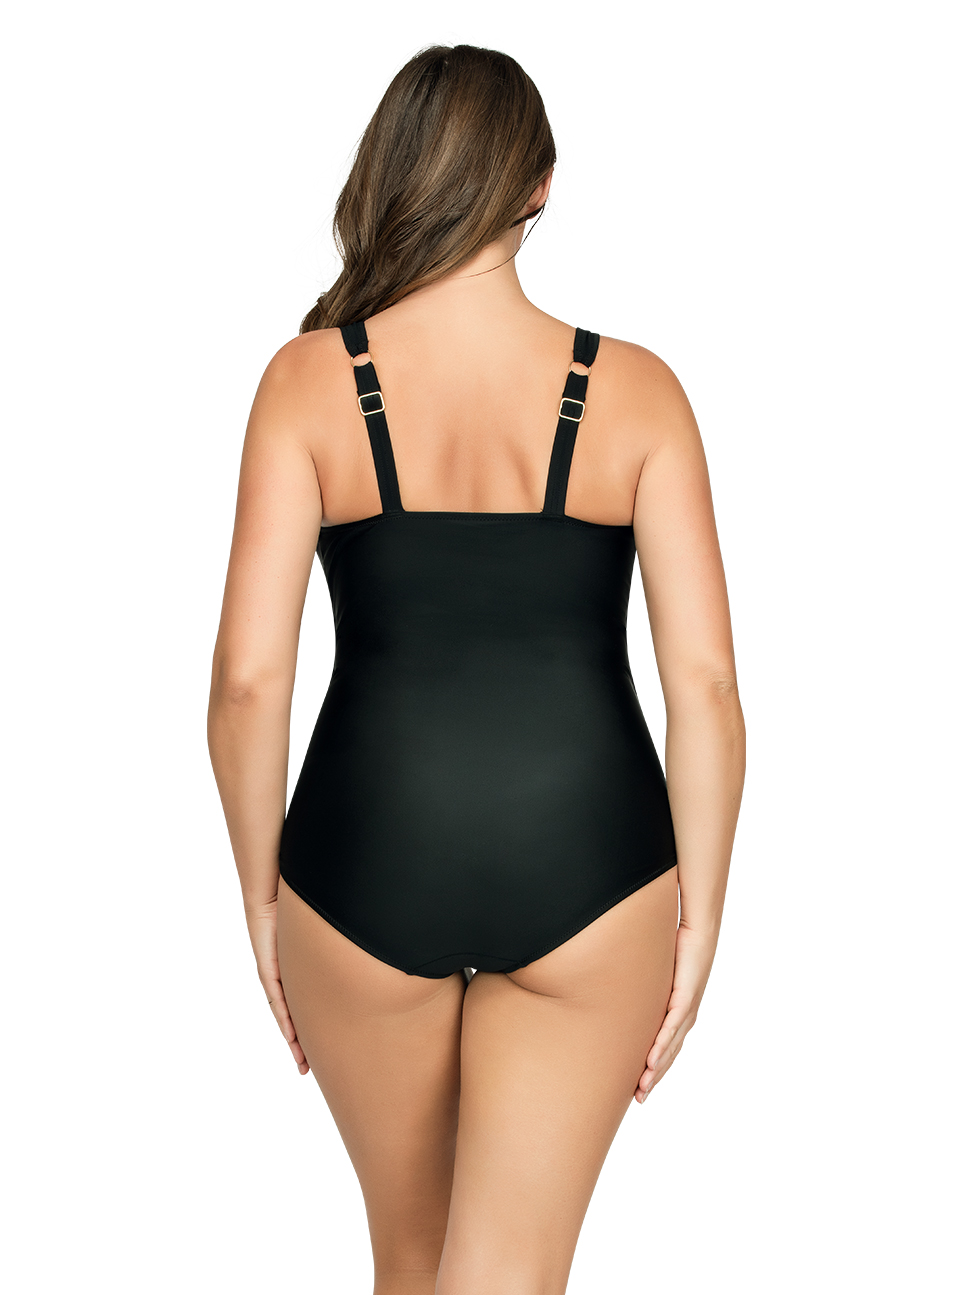 PARFAIT Oceane OnePieceSwimsuitS8066 Black Back - Oceane One-Piece Swimsuit Black S8066